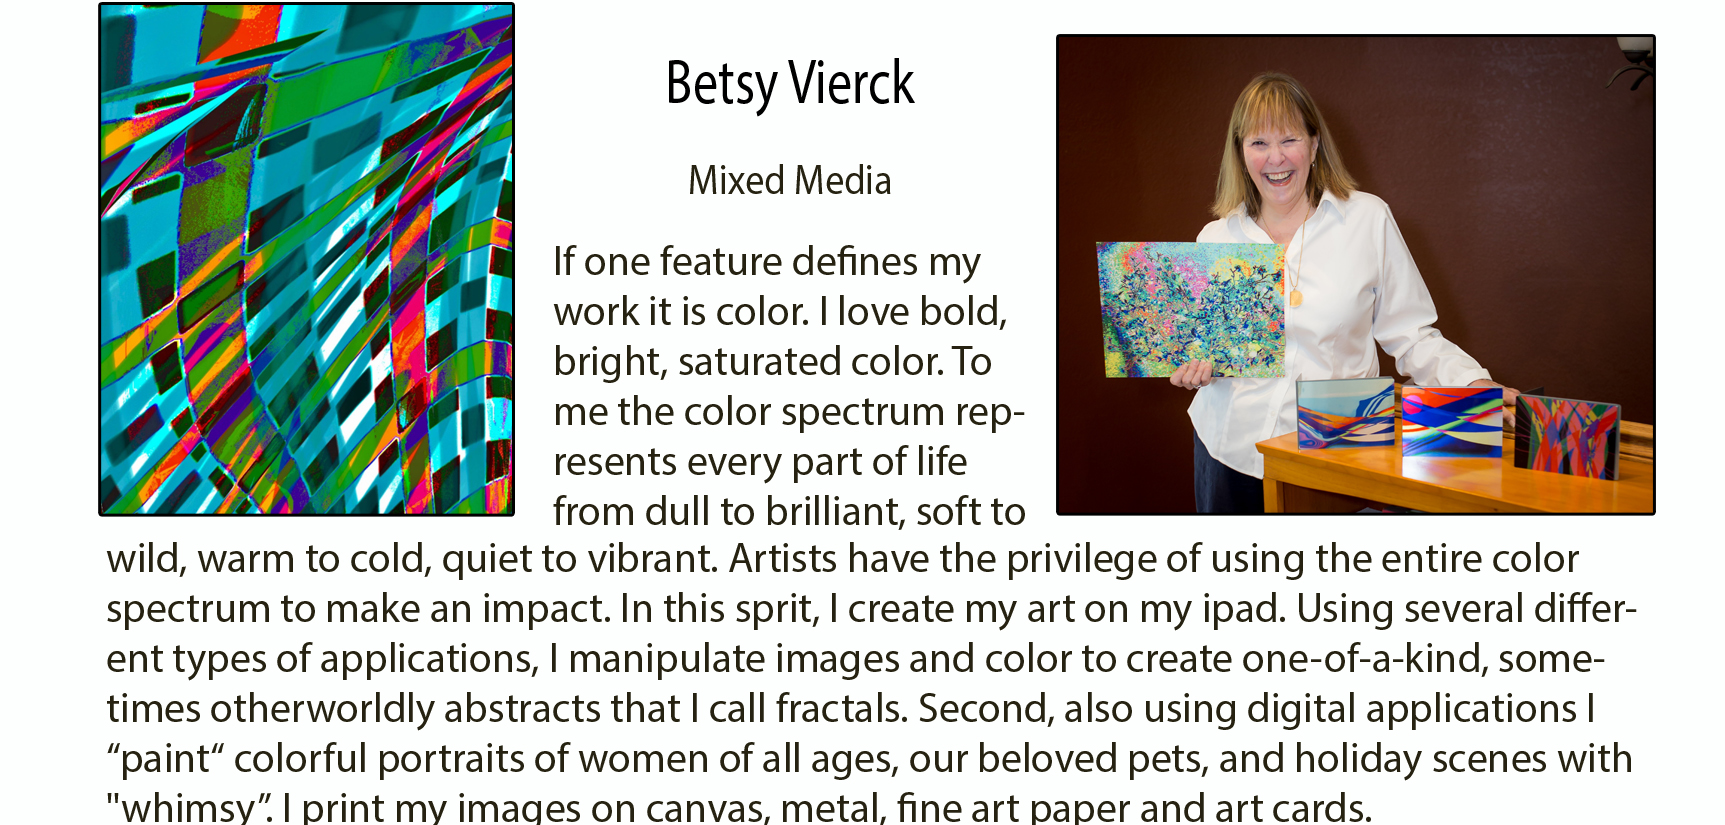 Betsy profile for FB.jpg